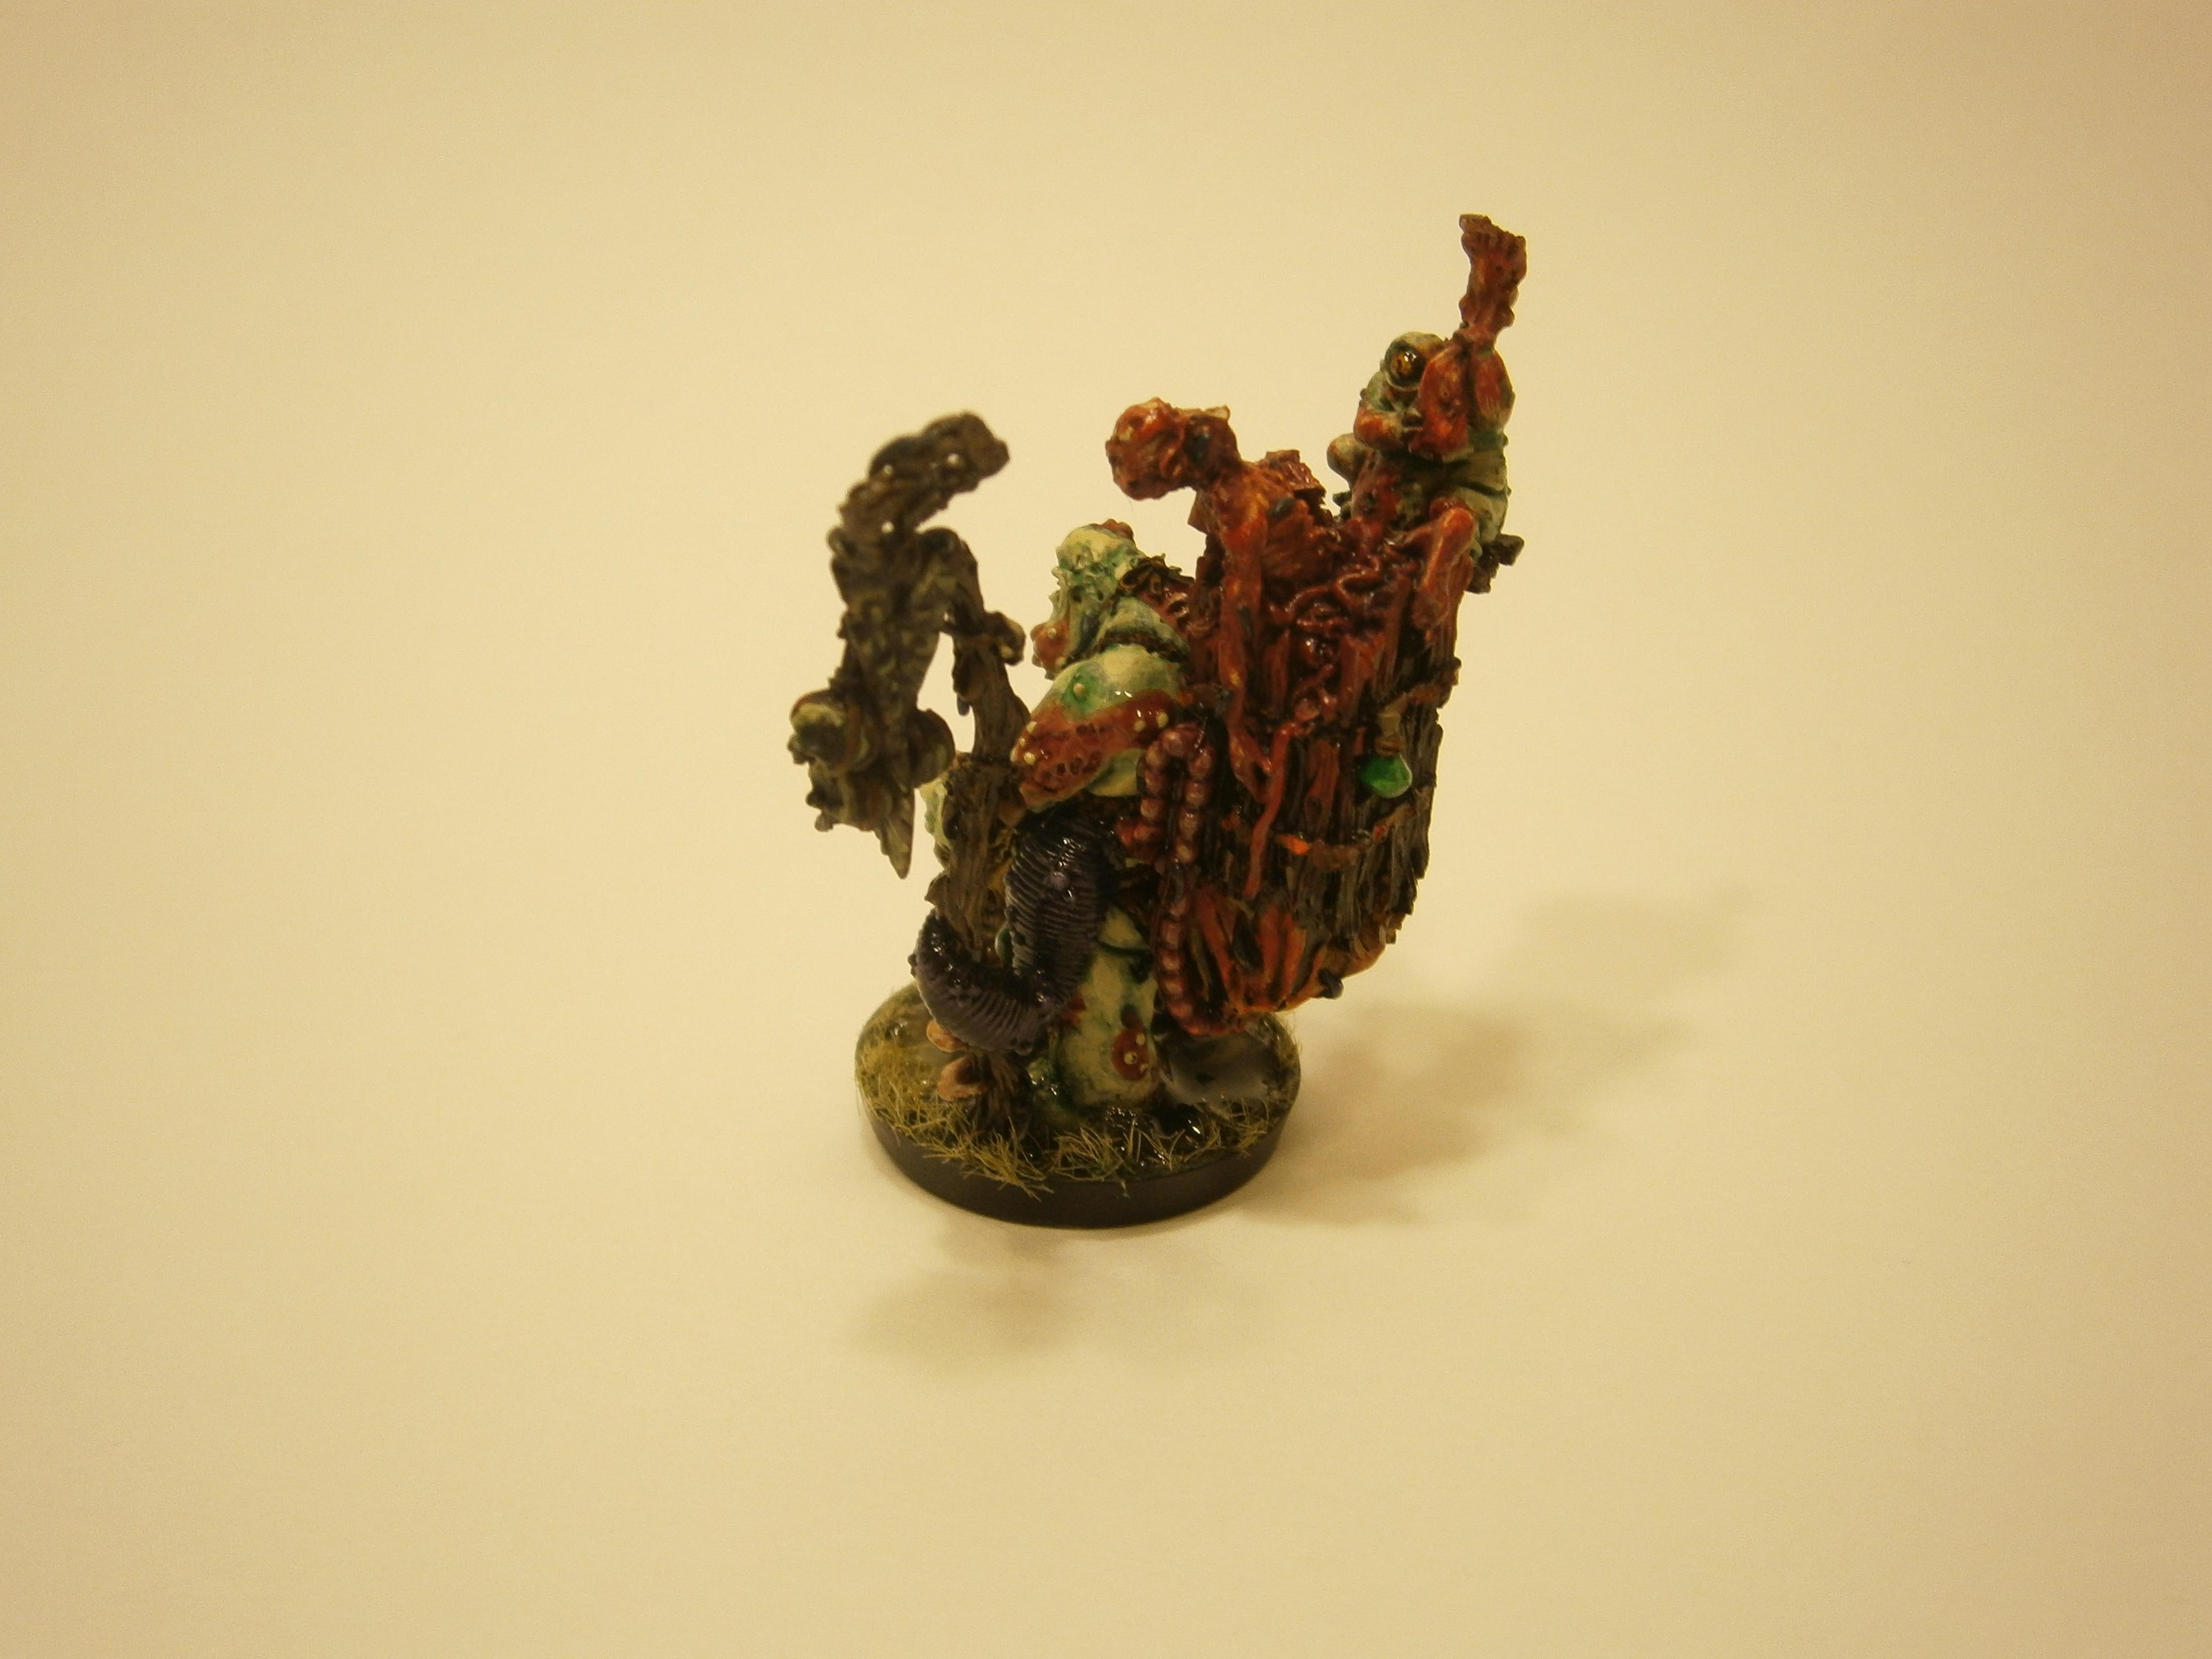 Chaos, Festus The Leech Lord, Gross, Nurgle, Rot, Swamp